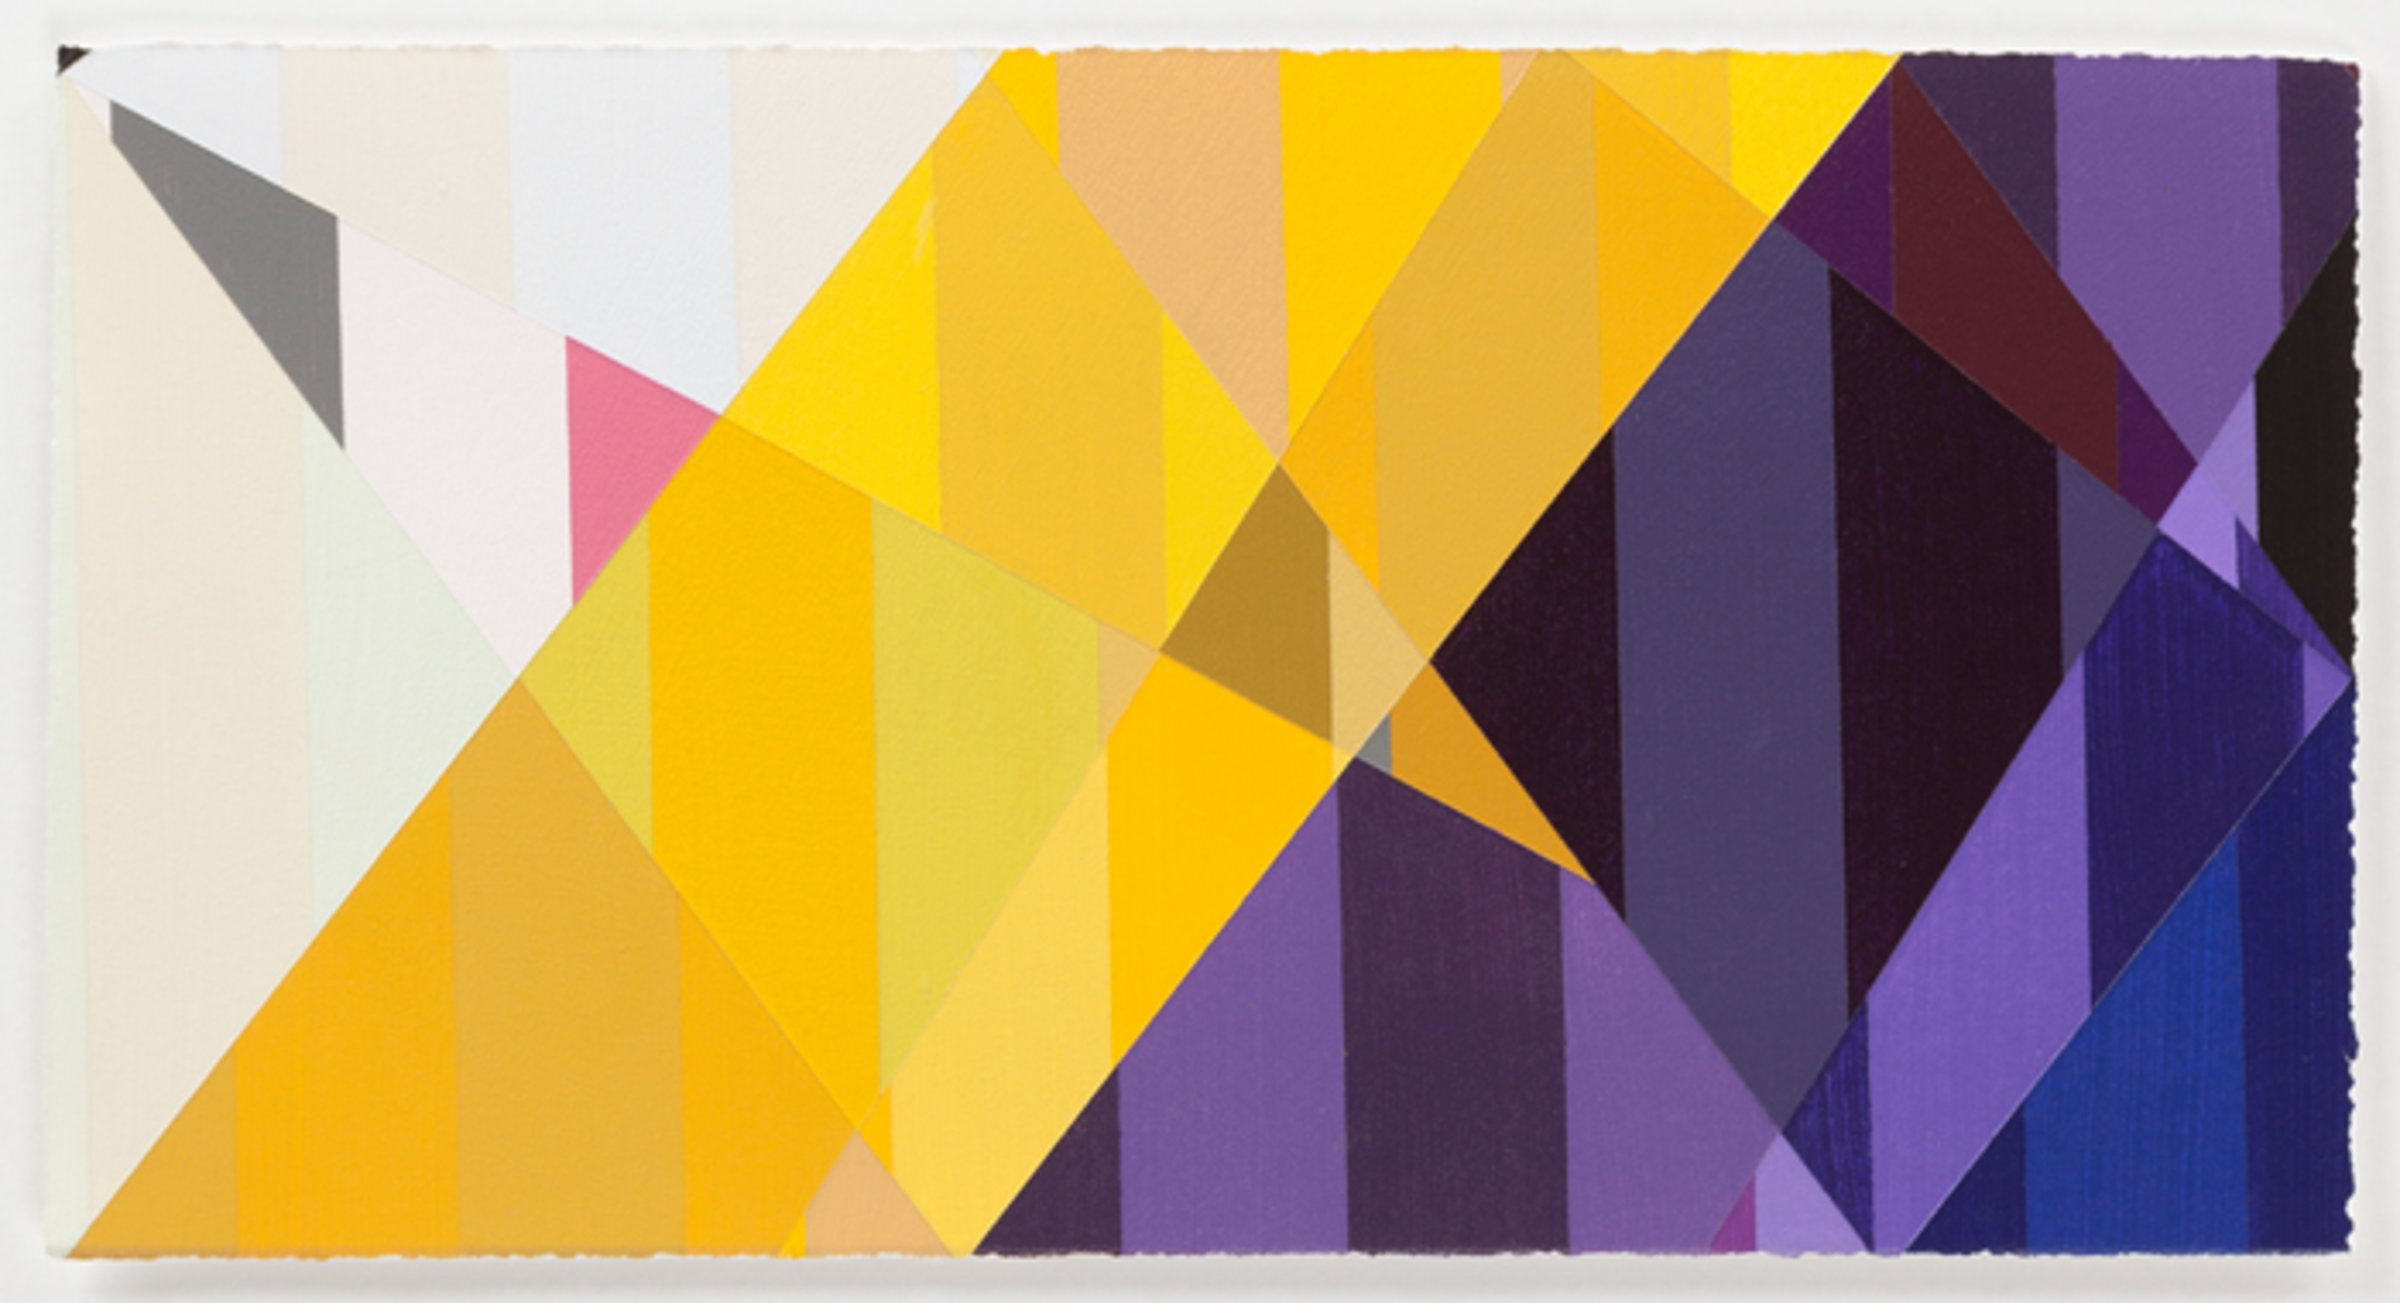 Jerry Walden, Hundred Thirty Nine (Dan El), 2014